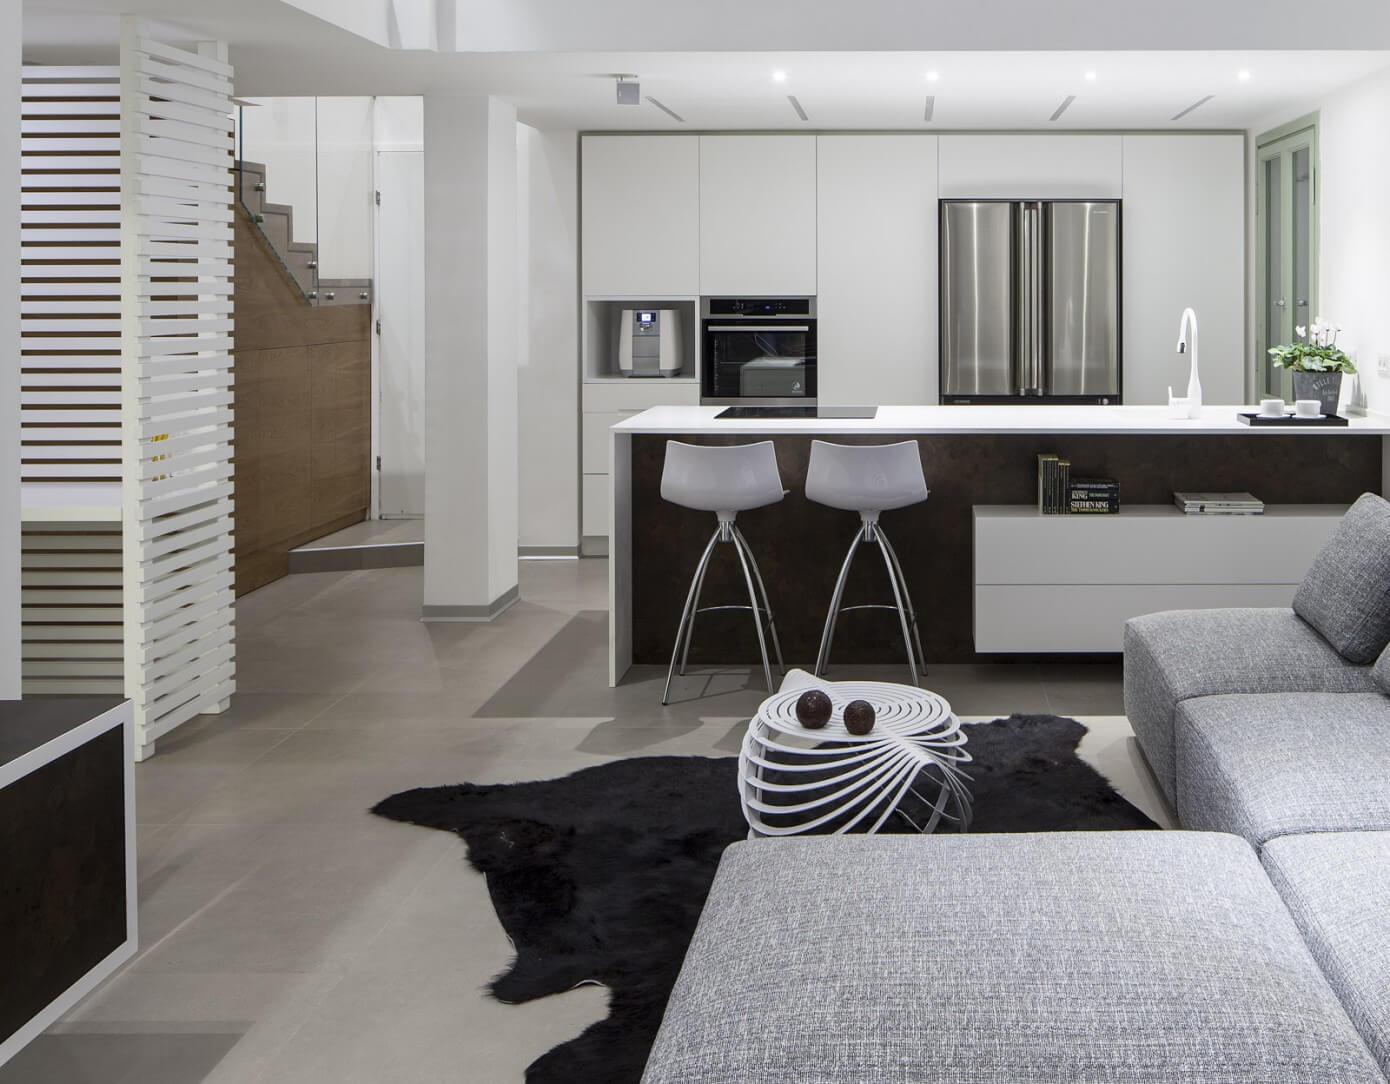 Urban Loft By Blv Design Architecture Homeadore